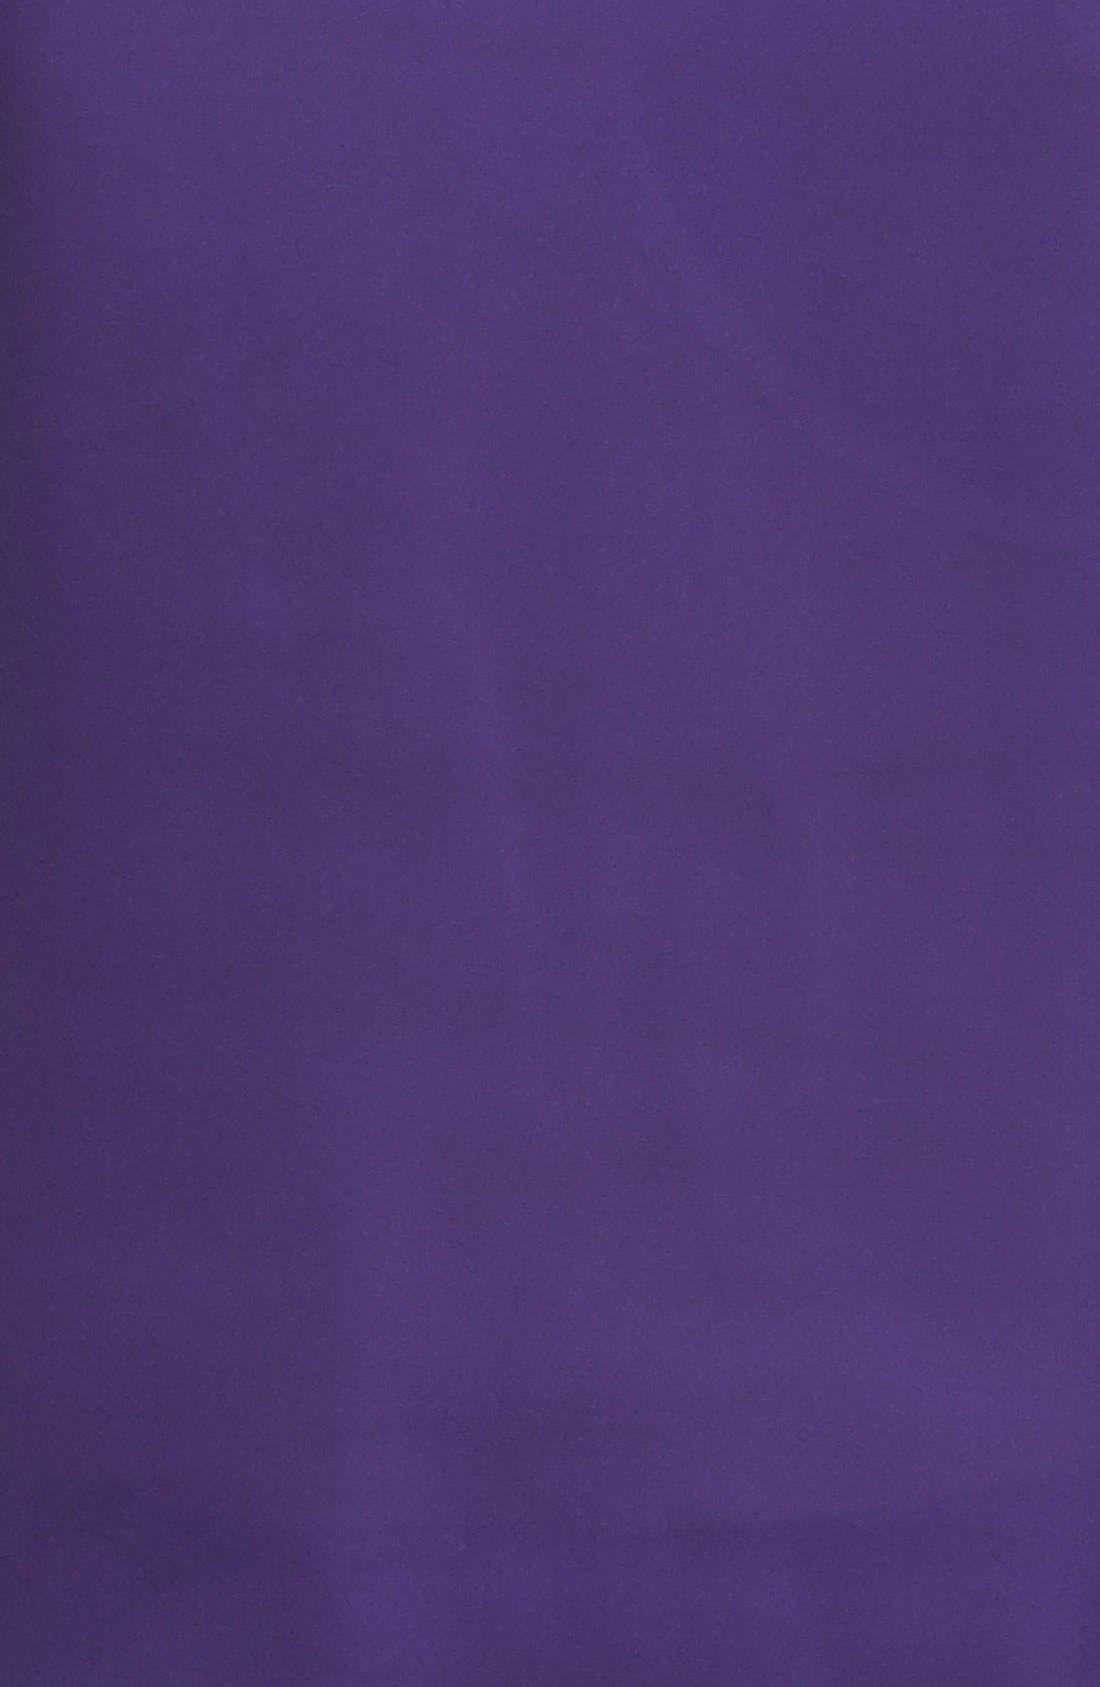 Alternate Image 3  - MICHAEL Michael Kors Woven Front Scoop Neck Top (Plus Size)